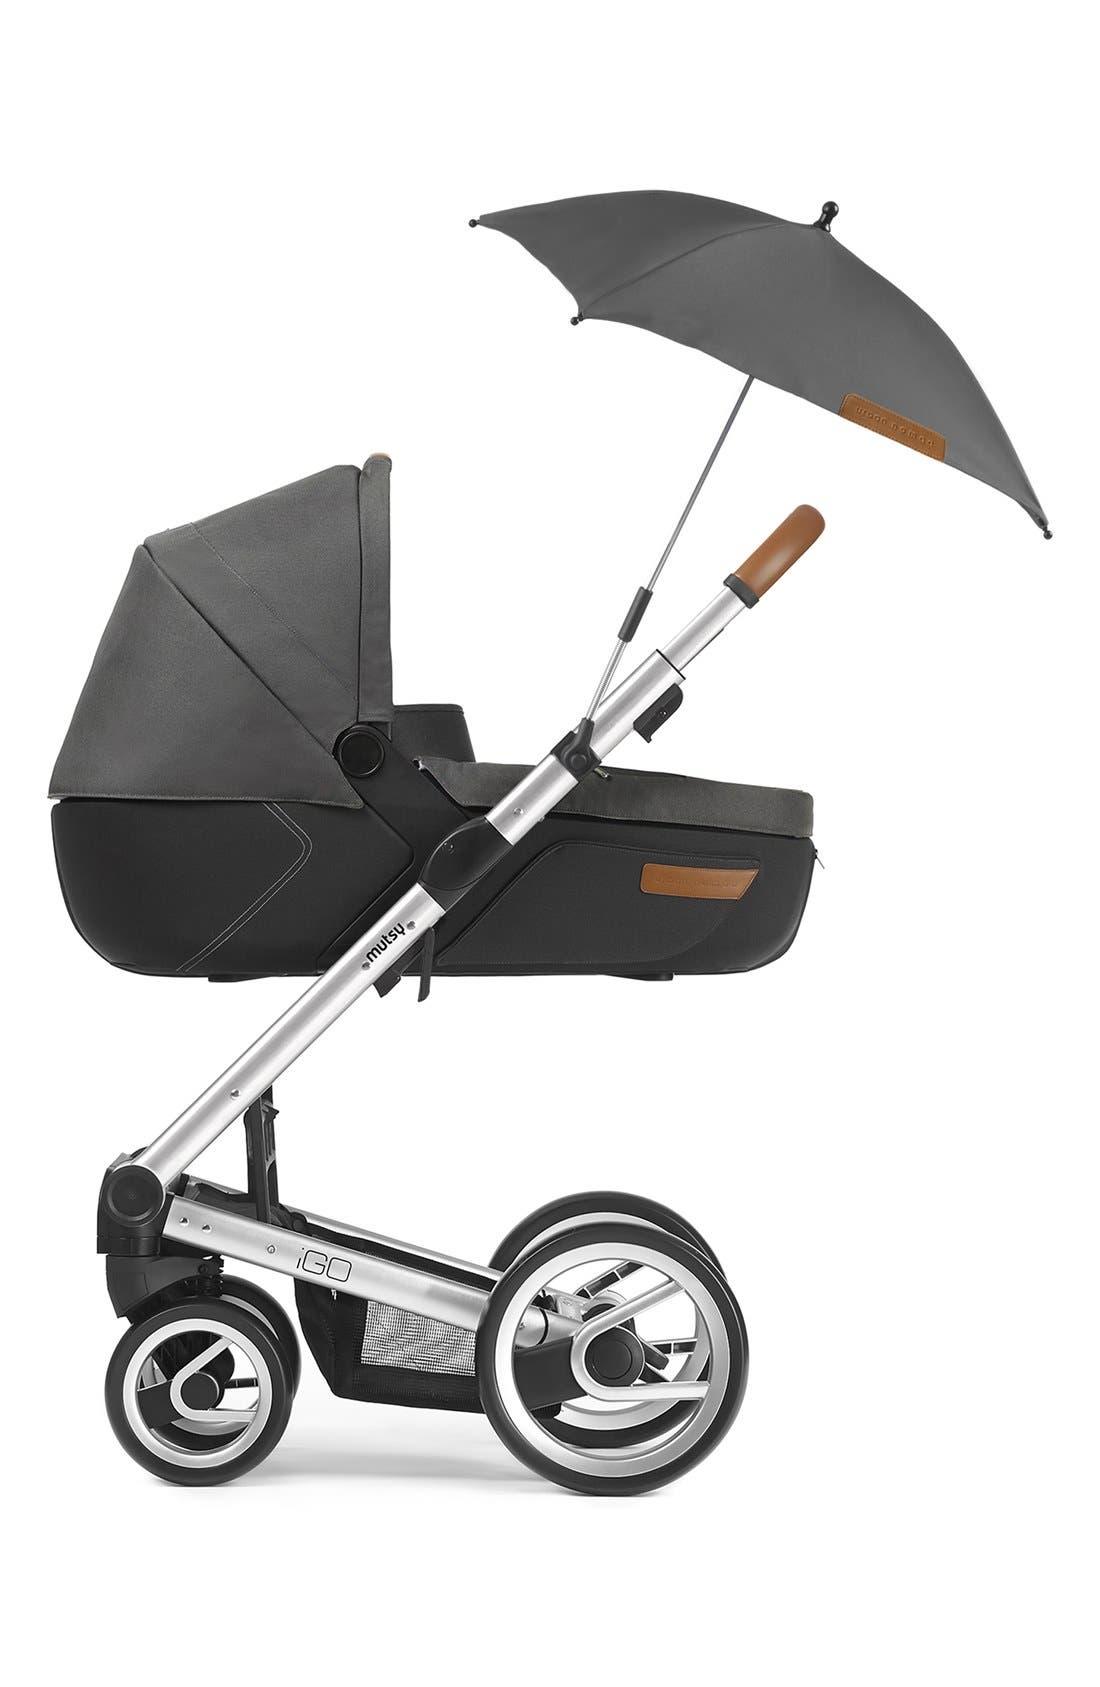 'Igo - Reflect Cosmo Black' Water Resistant Stroller Umbrella,                             Alternate thumbnail 2, color,                             Black